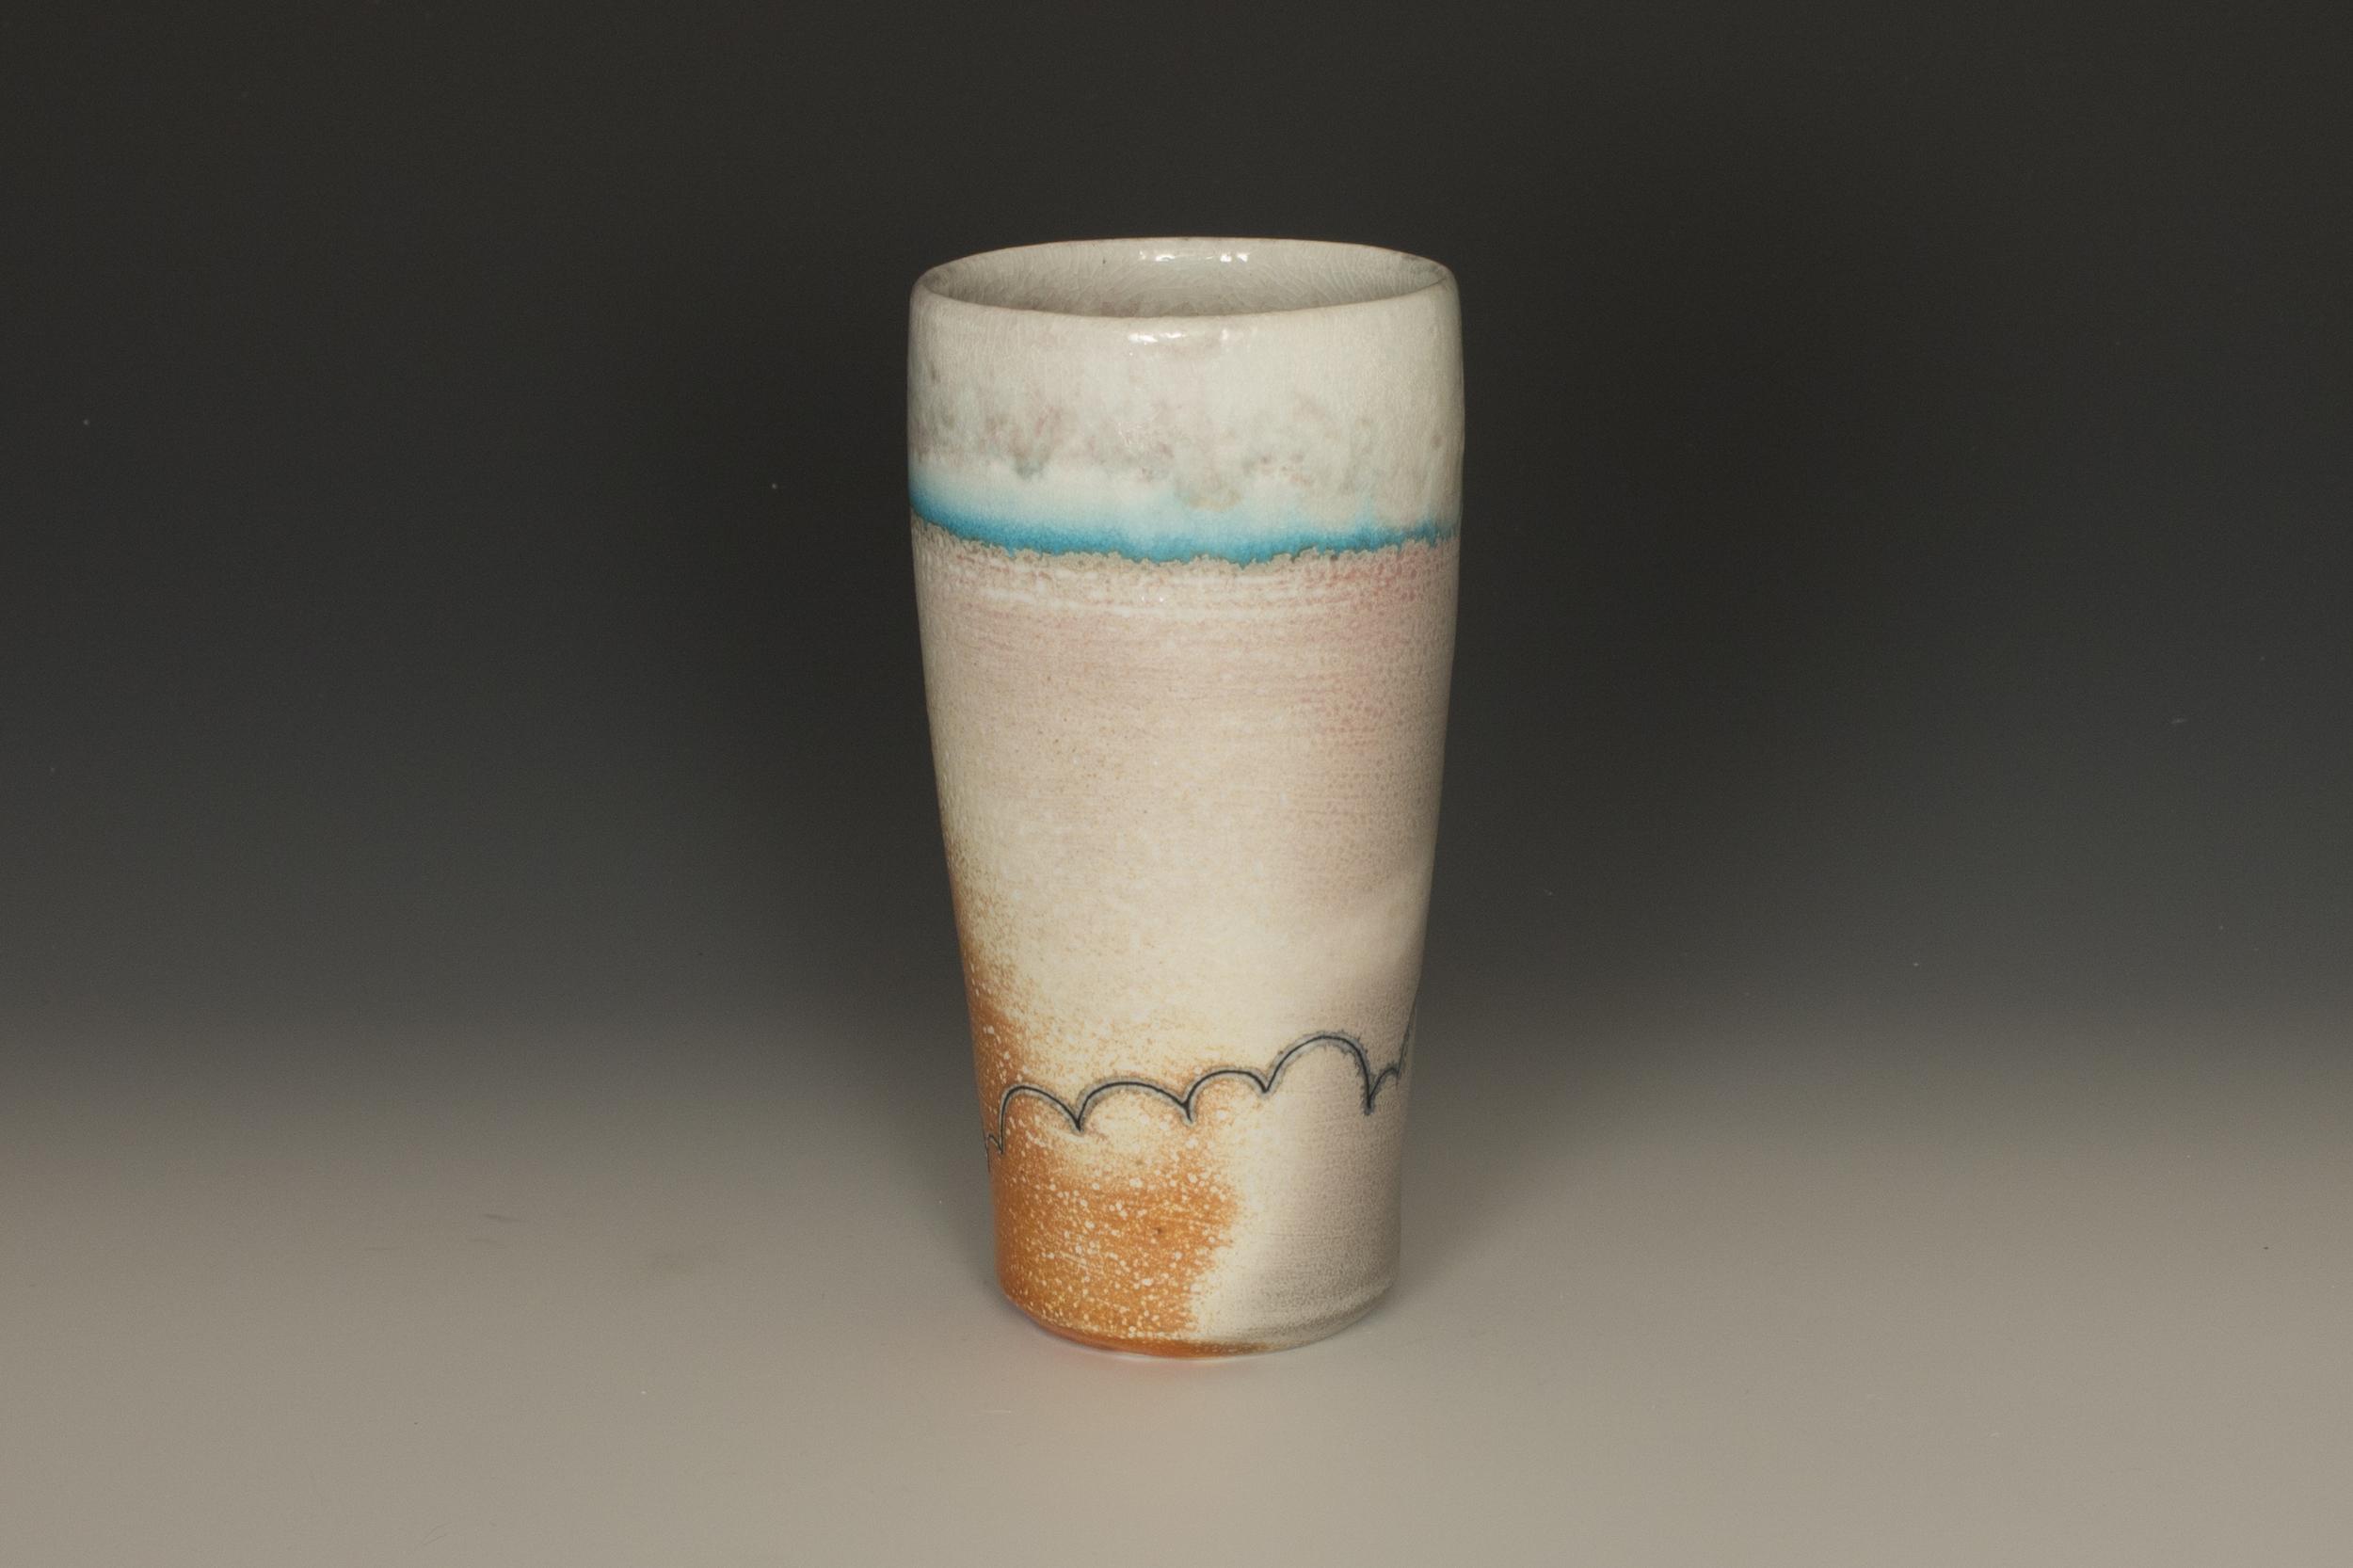 Cup-2.jpg